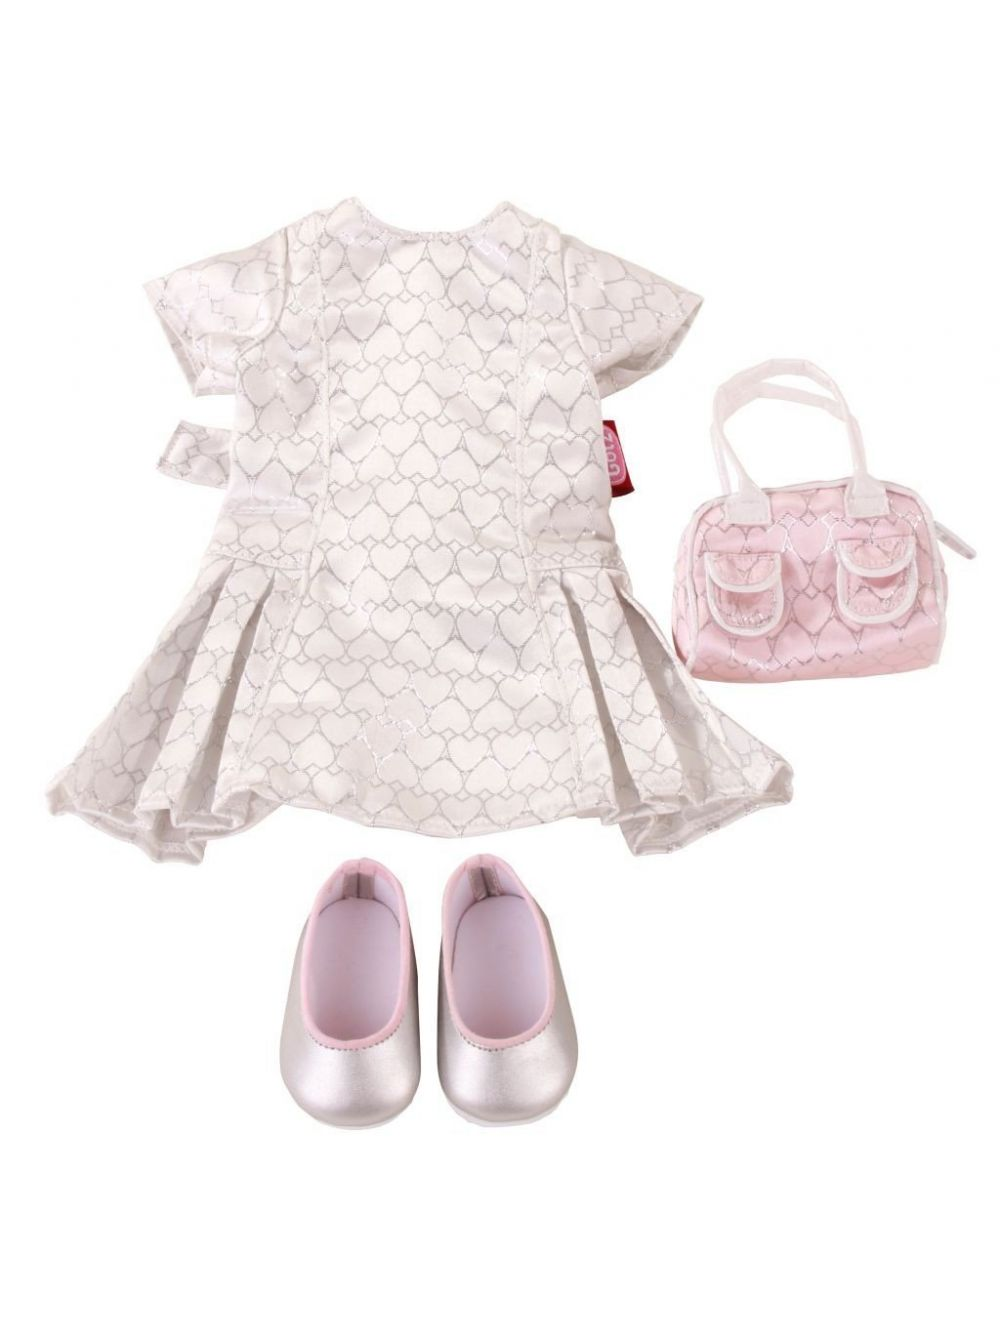 Pidulik komplekt - kleit, kott, kingad 45-50 cm